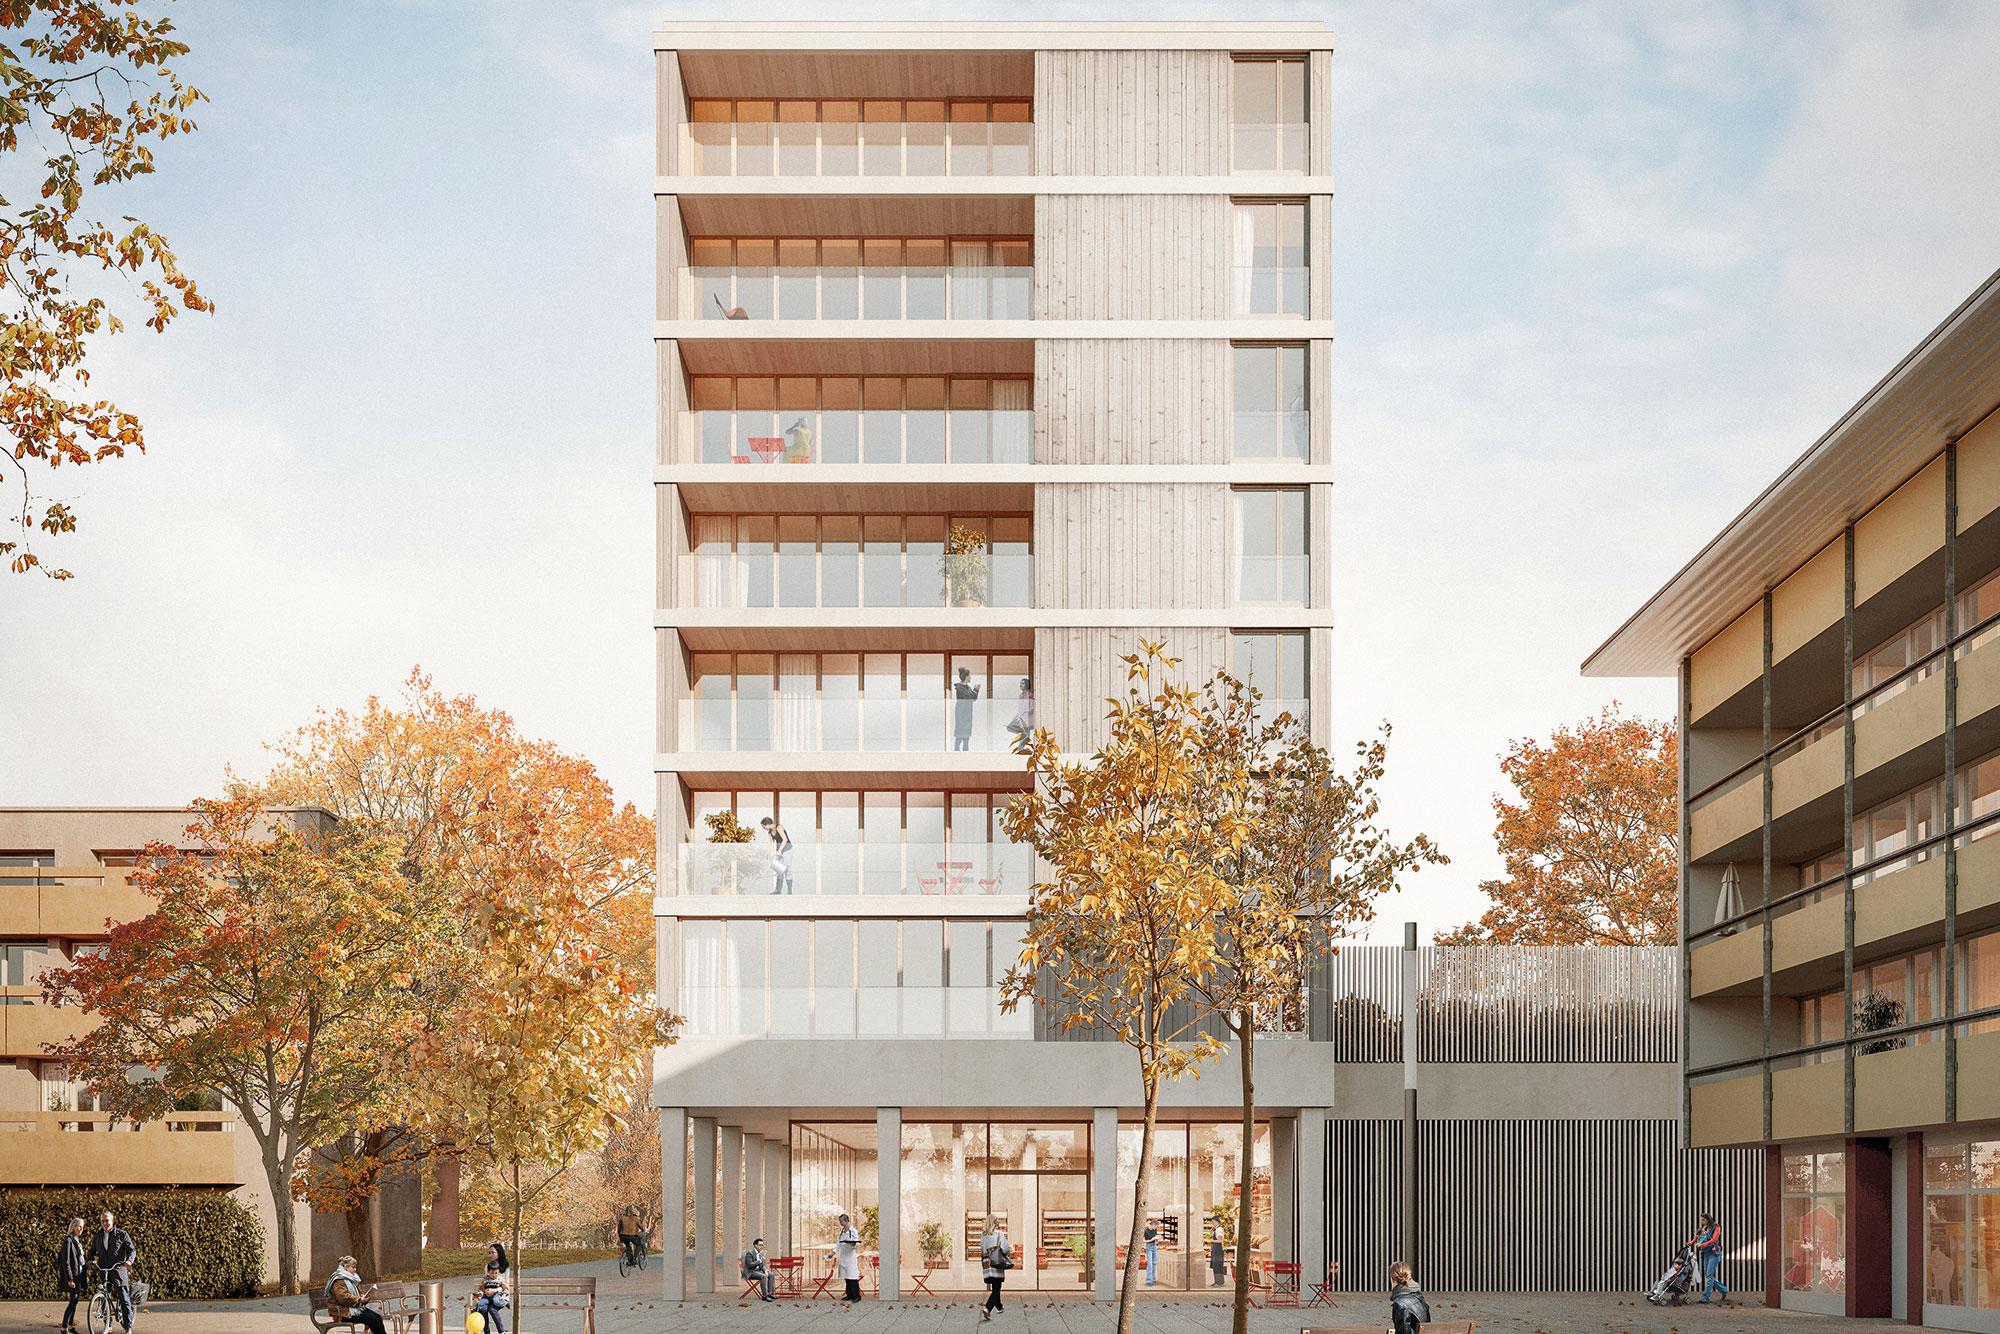 Wohn- Gewerbebau aus Holz – Bugg52 Freiburg